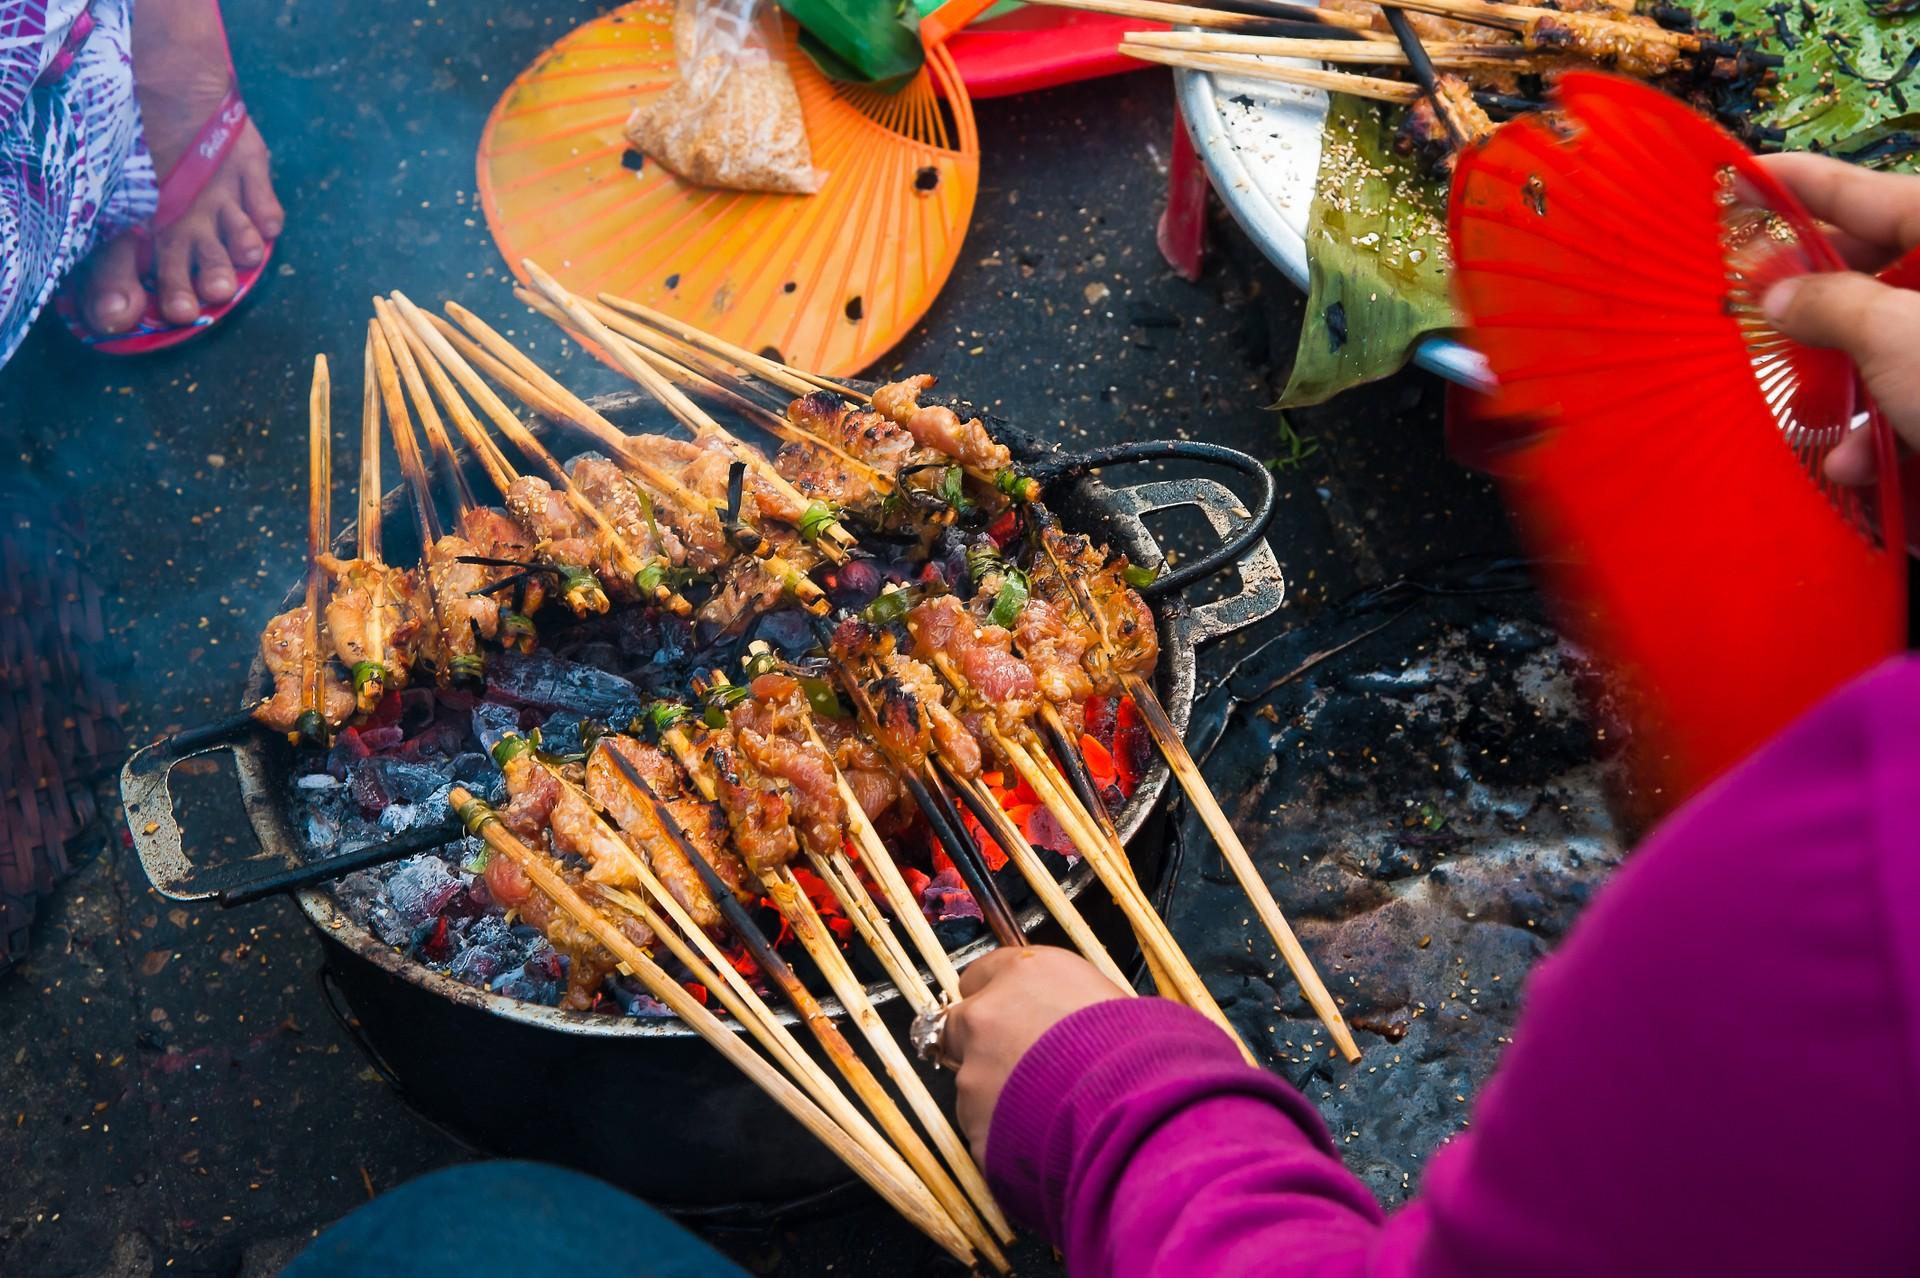 Vietnam food tour - Hoi An grilled meat